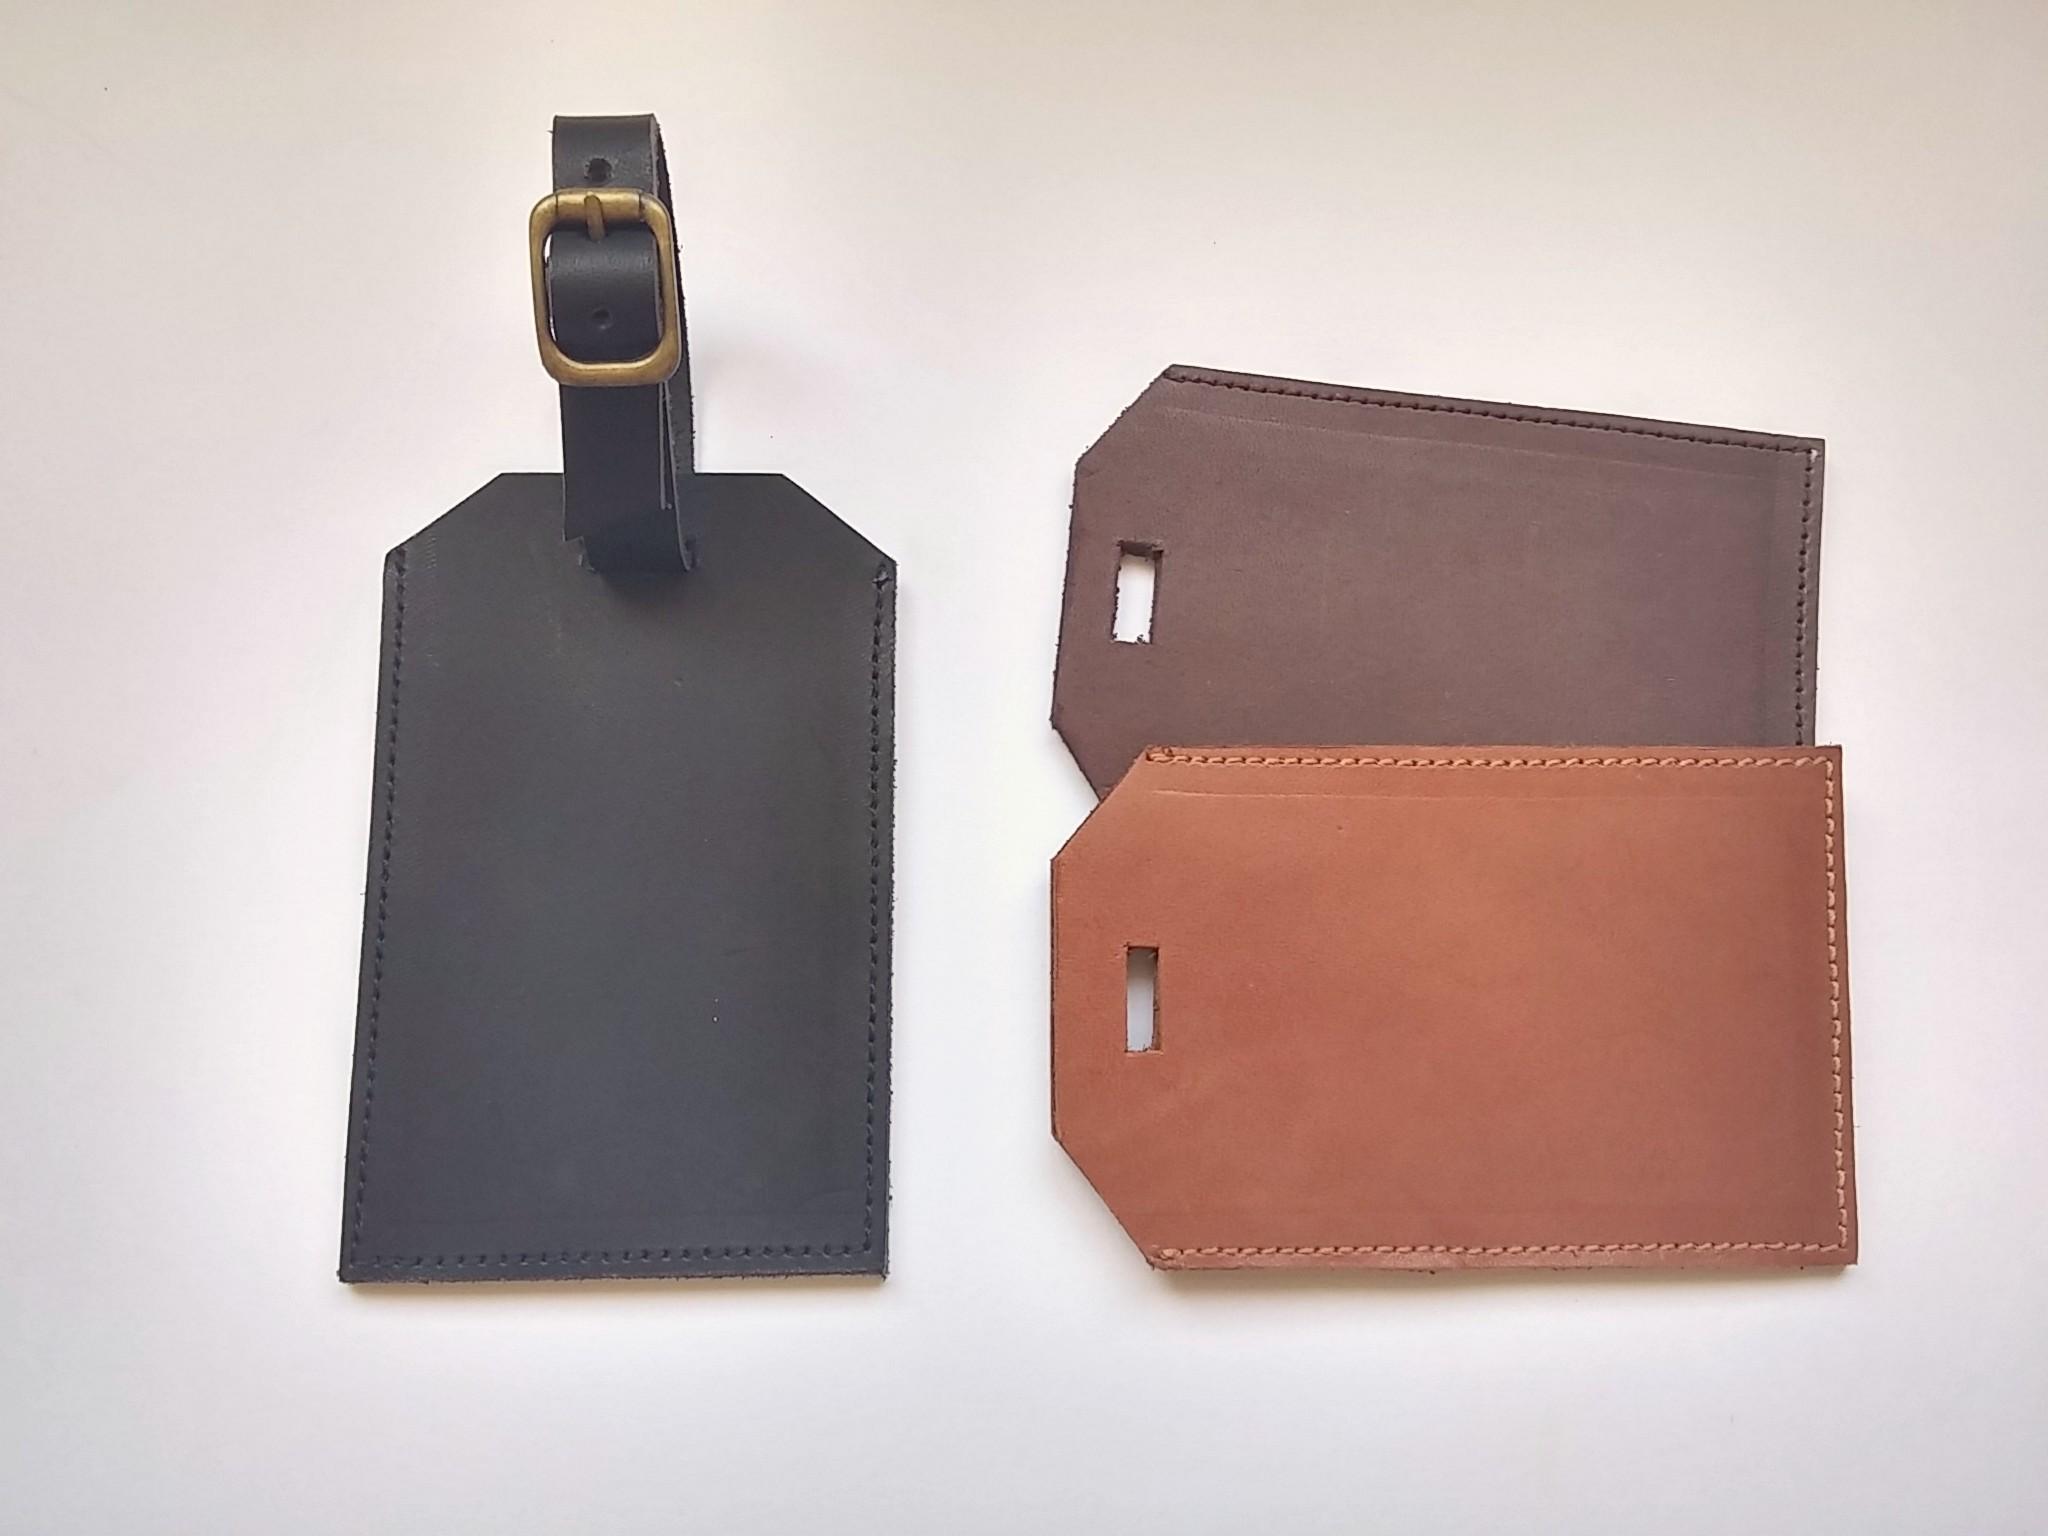 d6d1c9c312d4 Monogram leather luggage tags